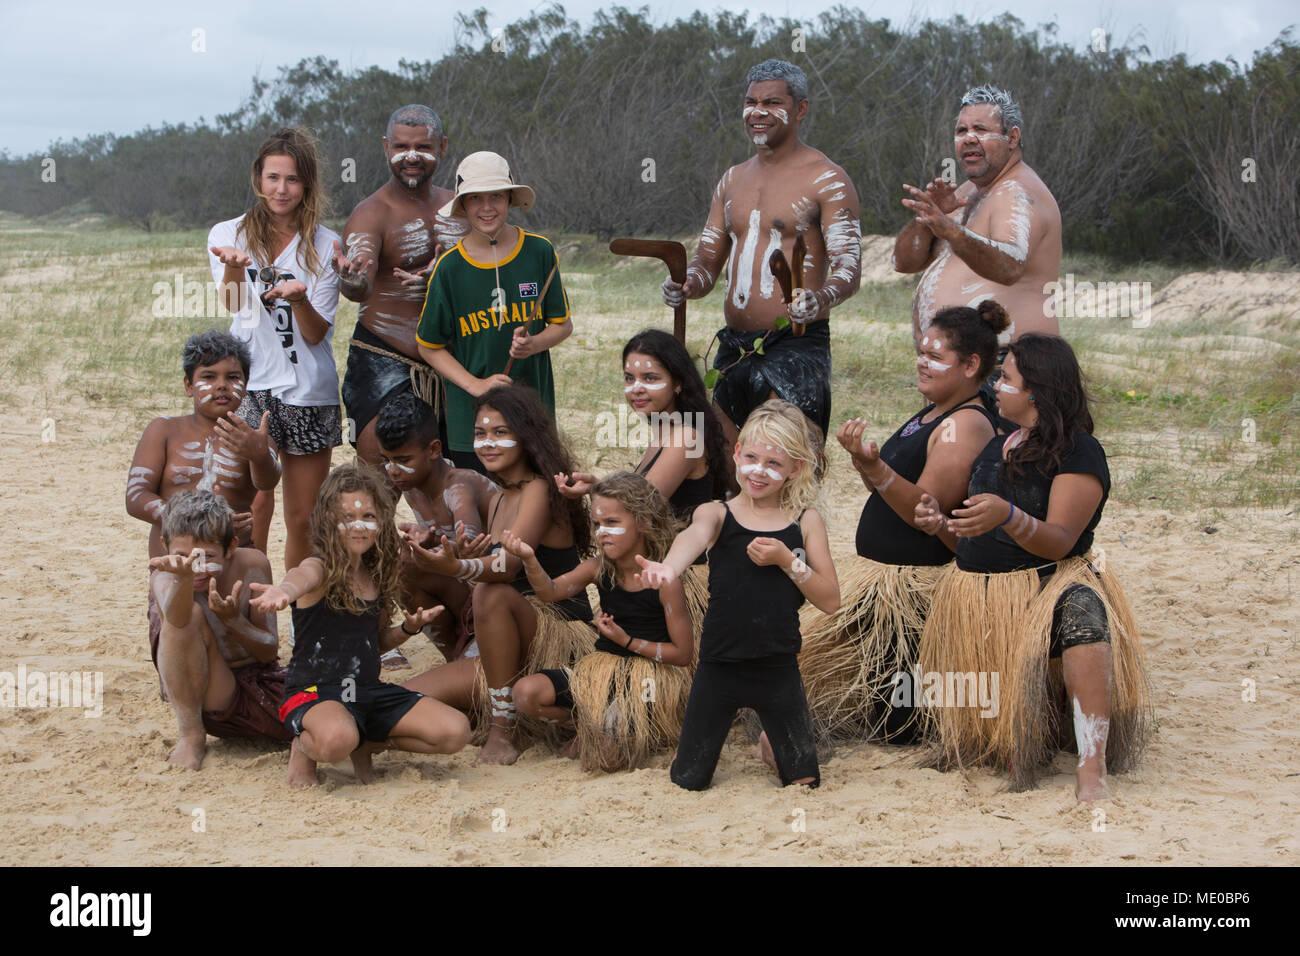 Aboriginal people dancing